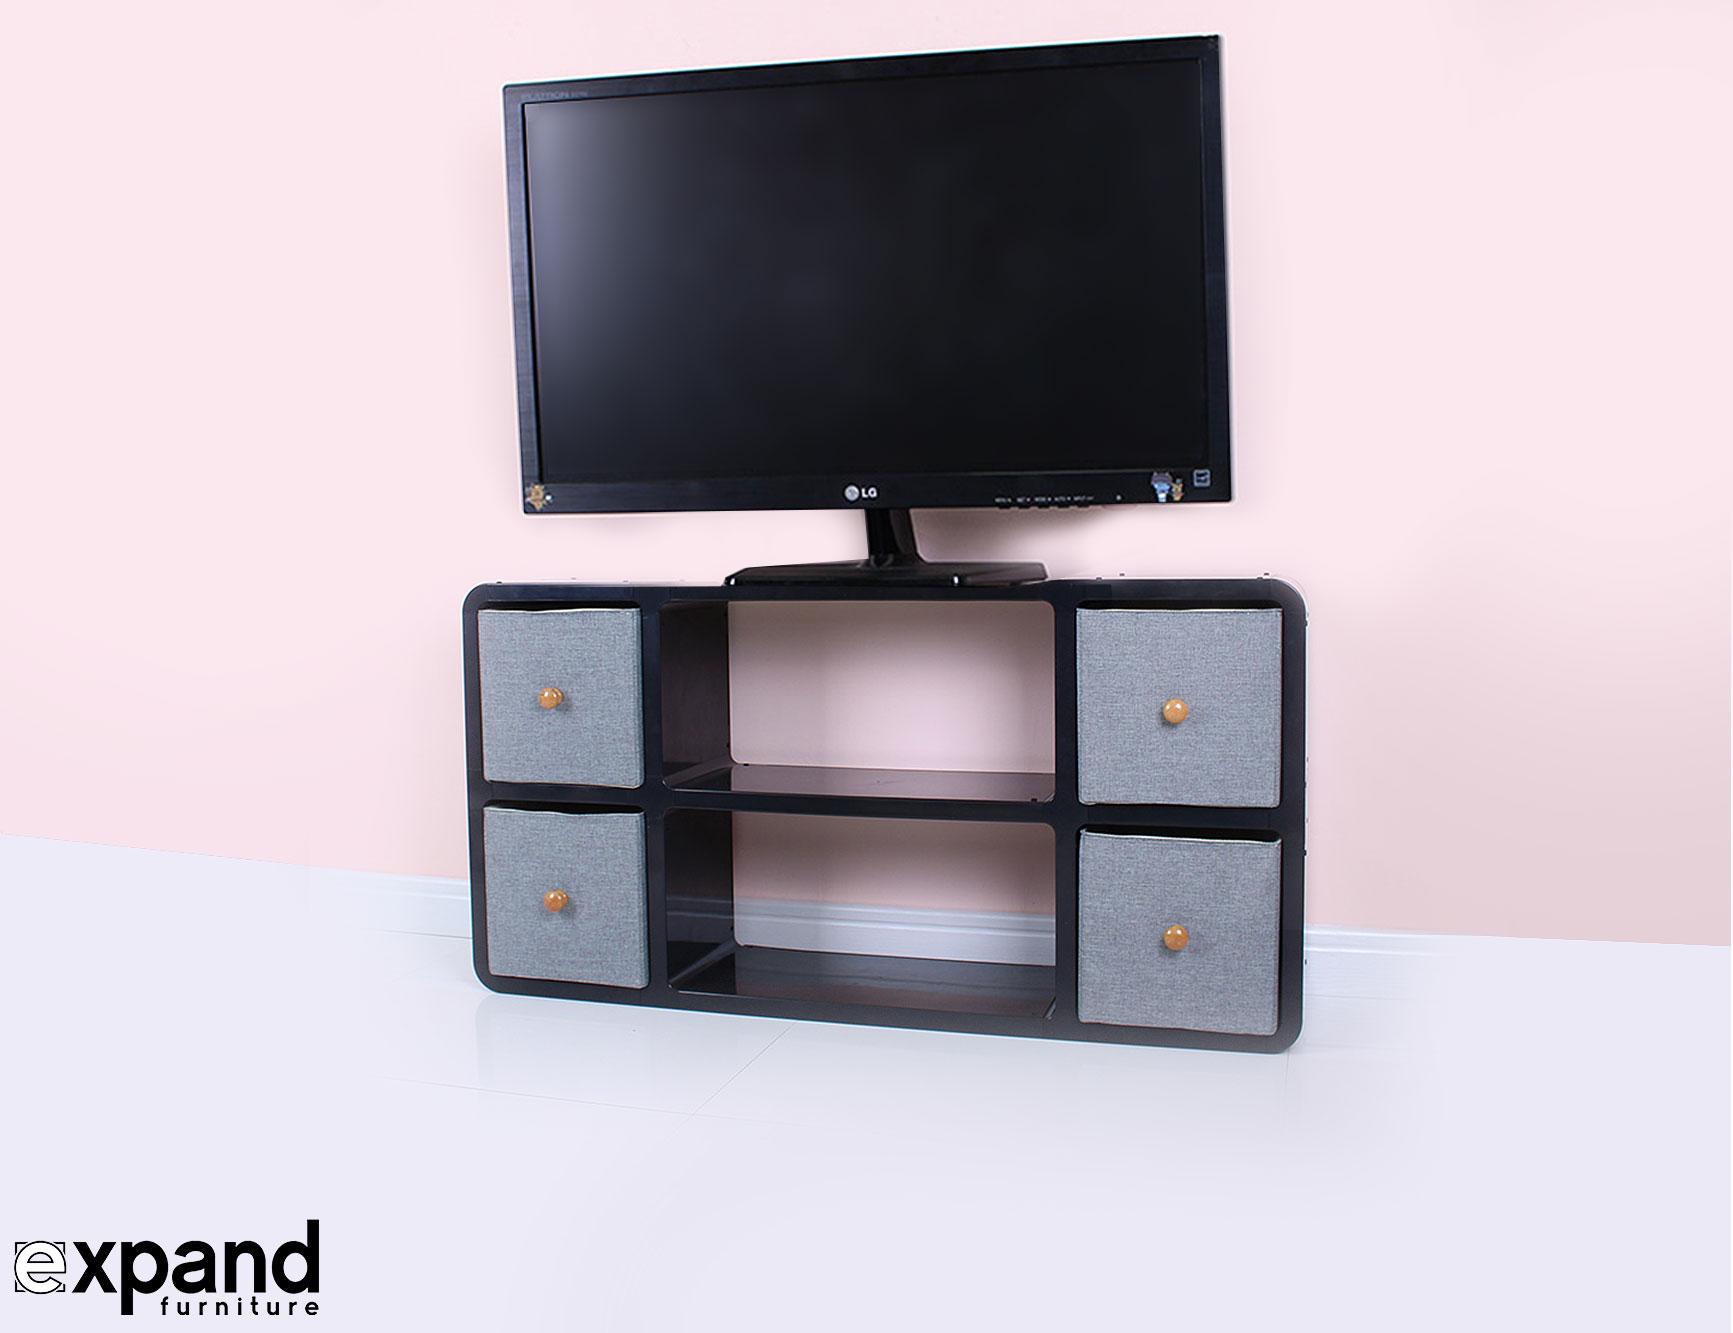 Slim Modern TV Stand Expand Furniture